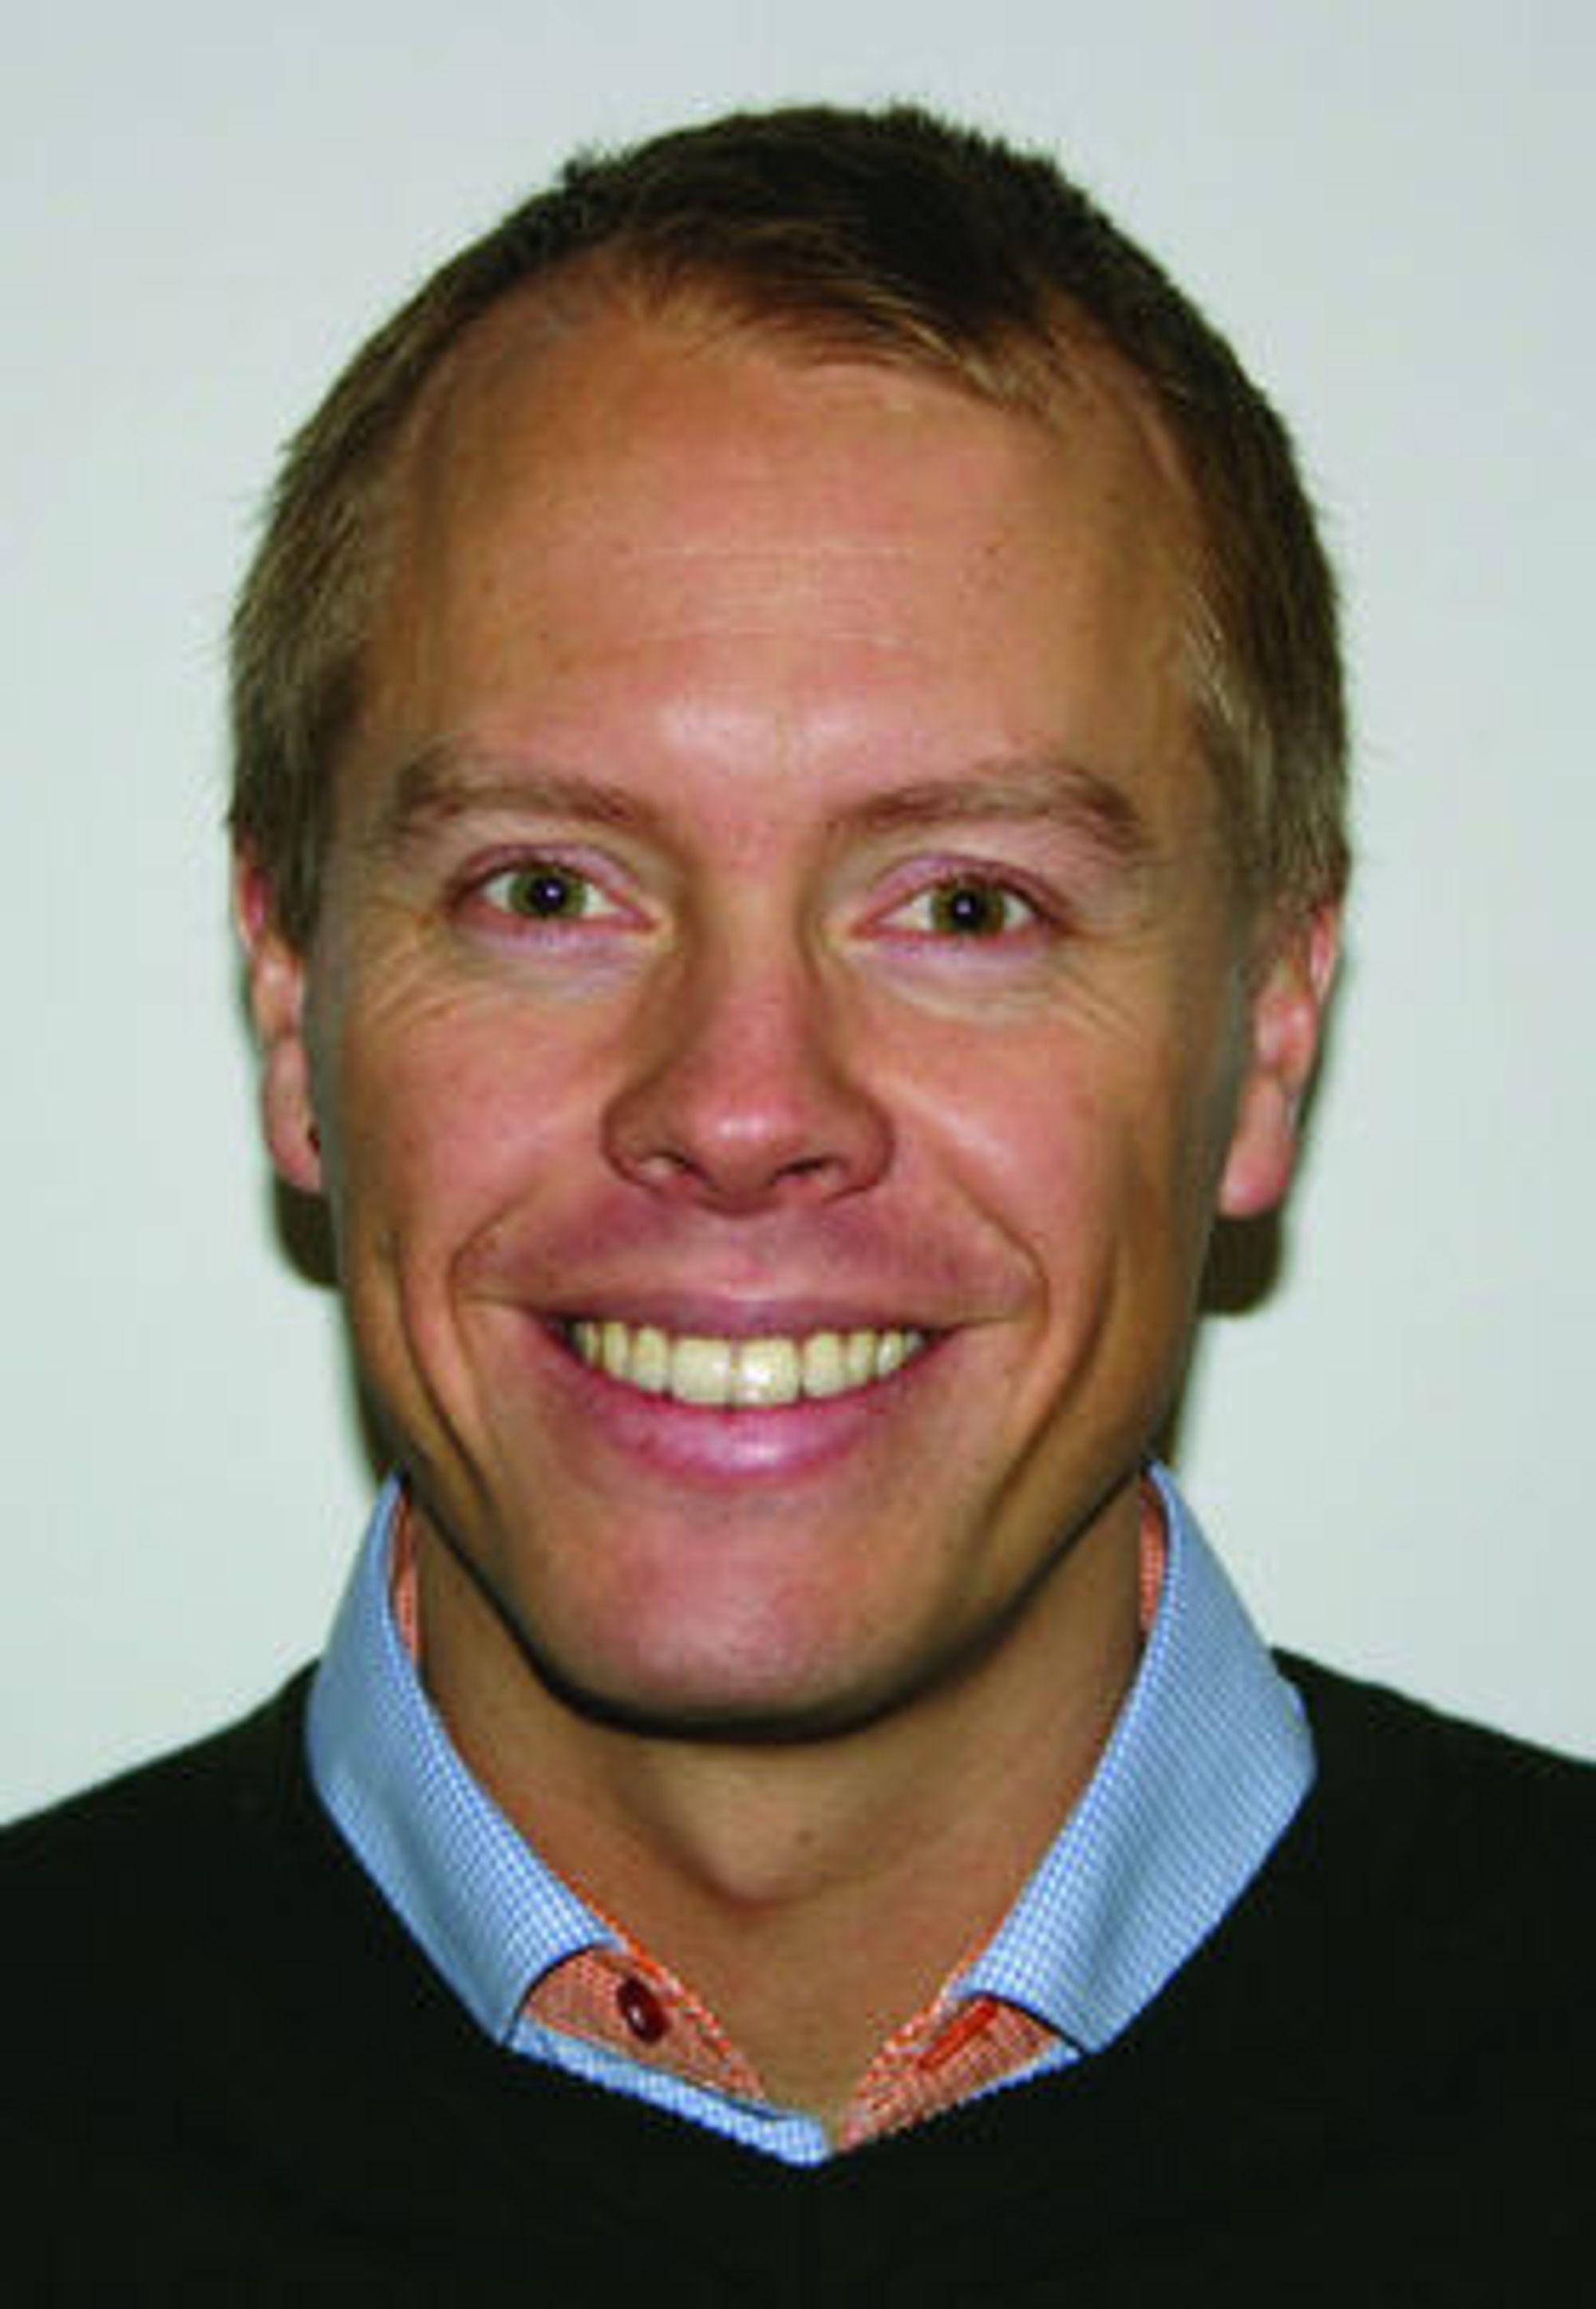 Lars Haakon Søraas er gründer av Legelisten.no AS.